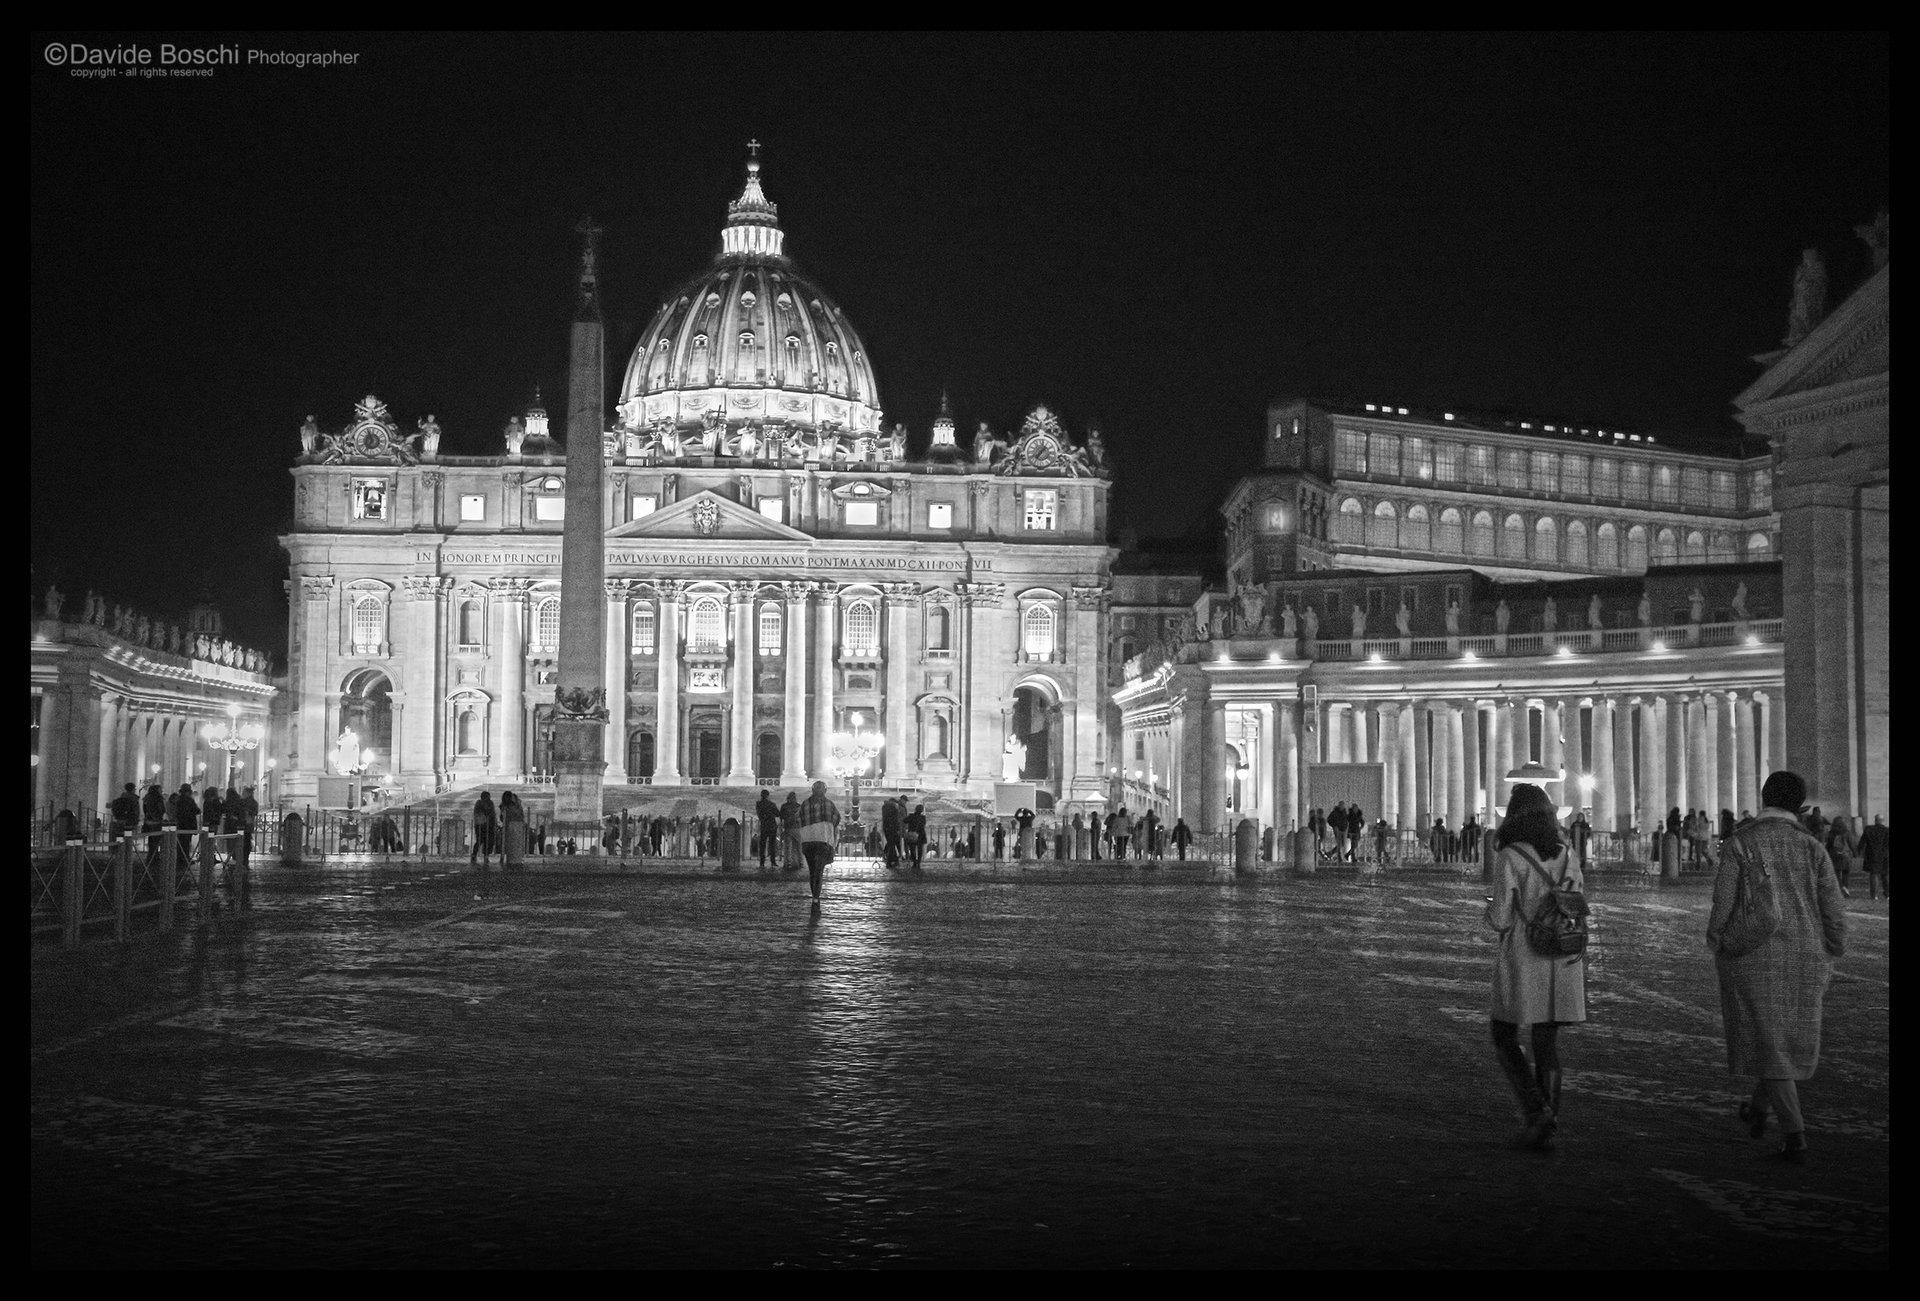 Foto notturna di piazza di san Pietro in Vaticano in bianco e nero